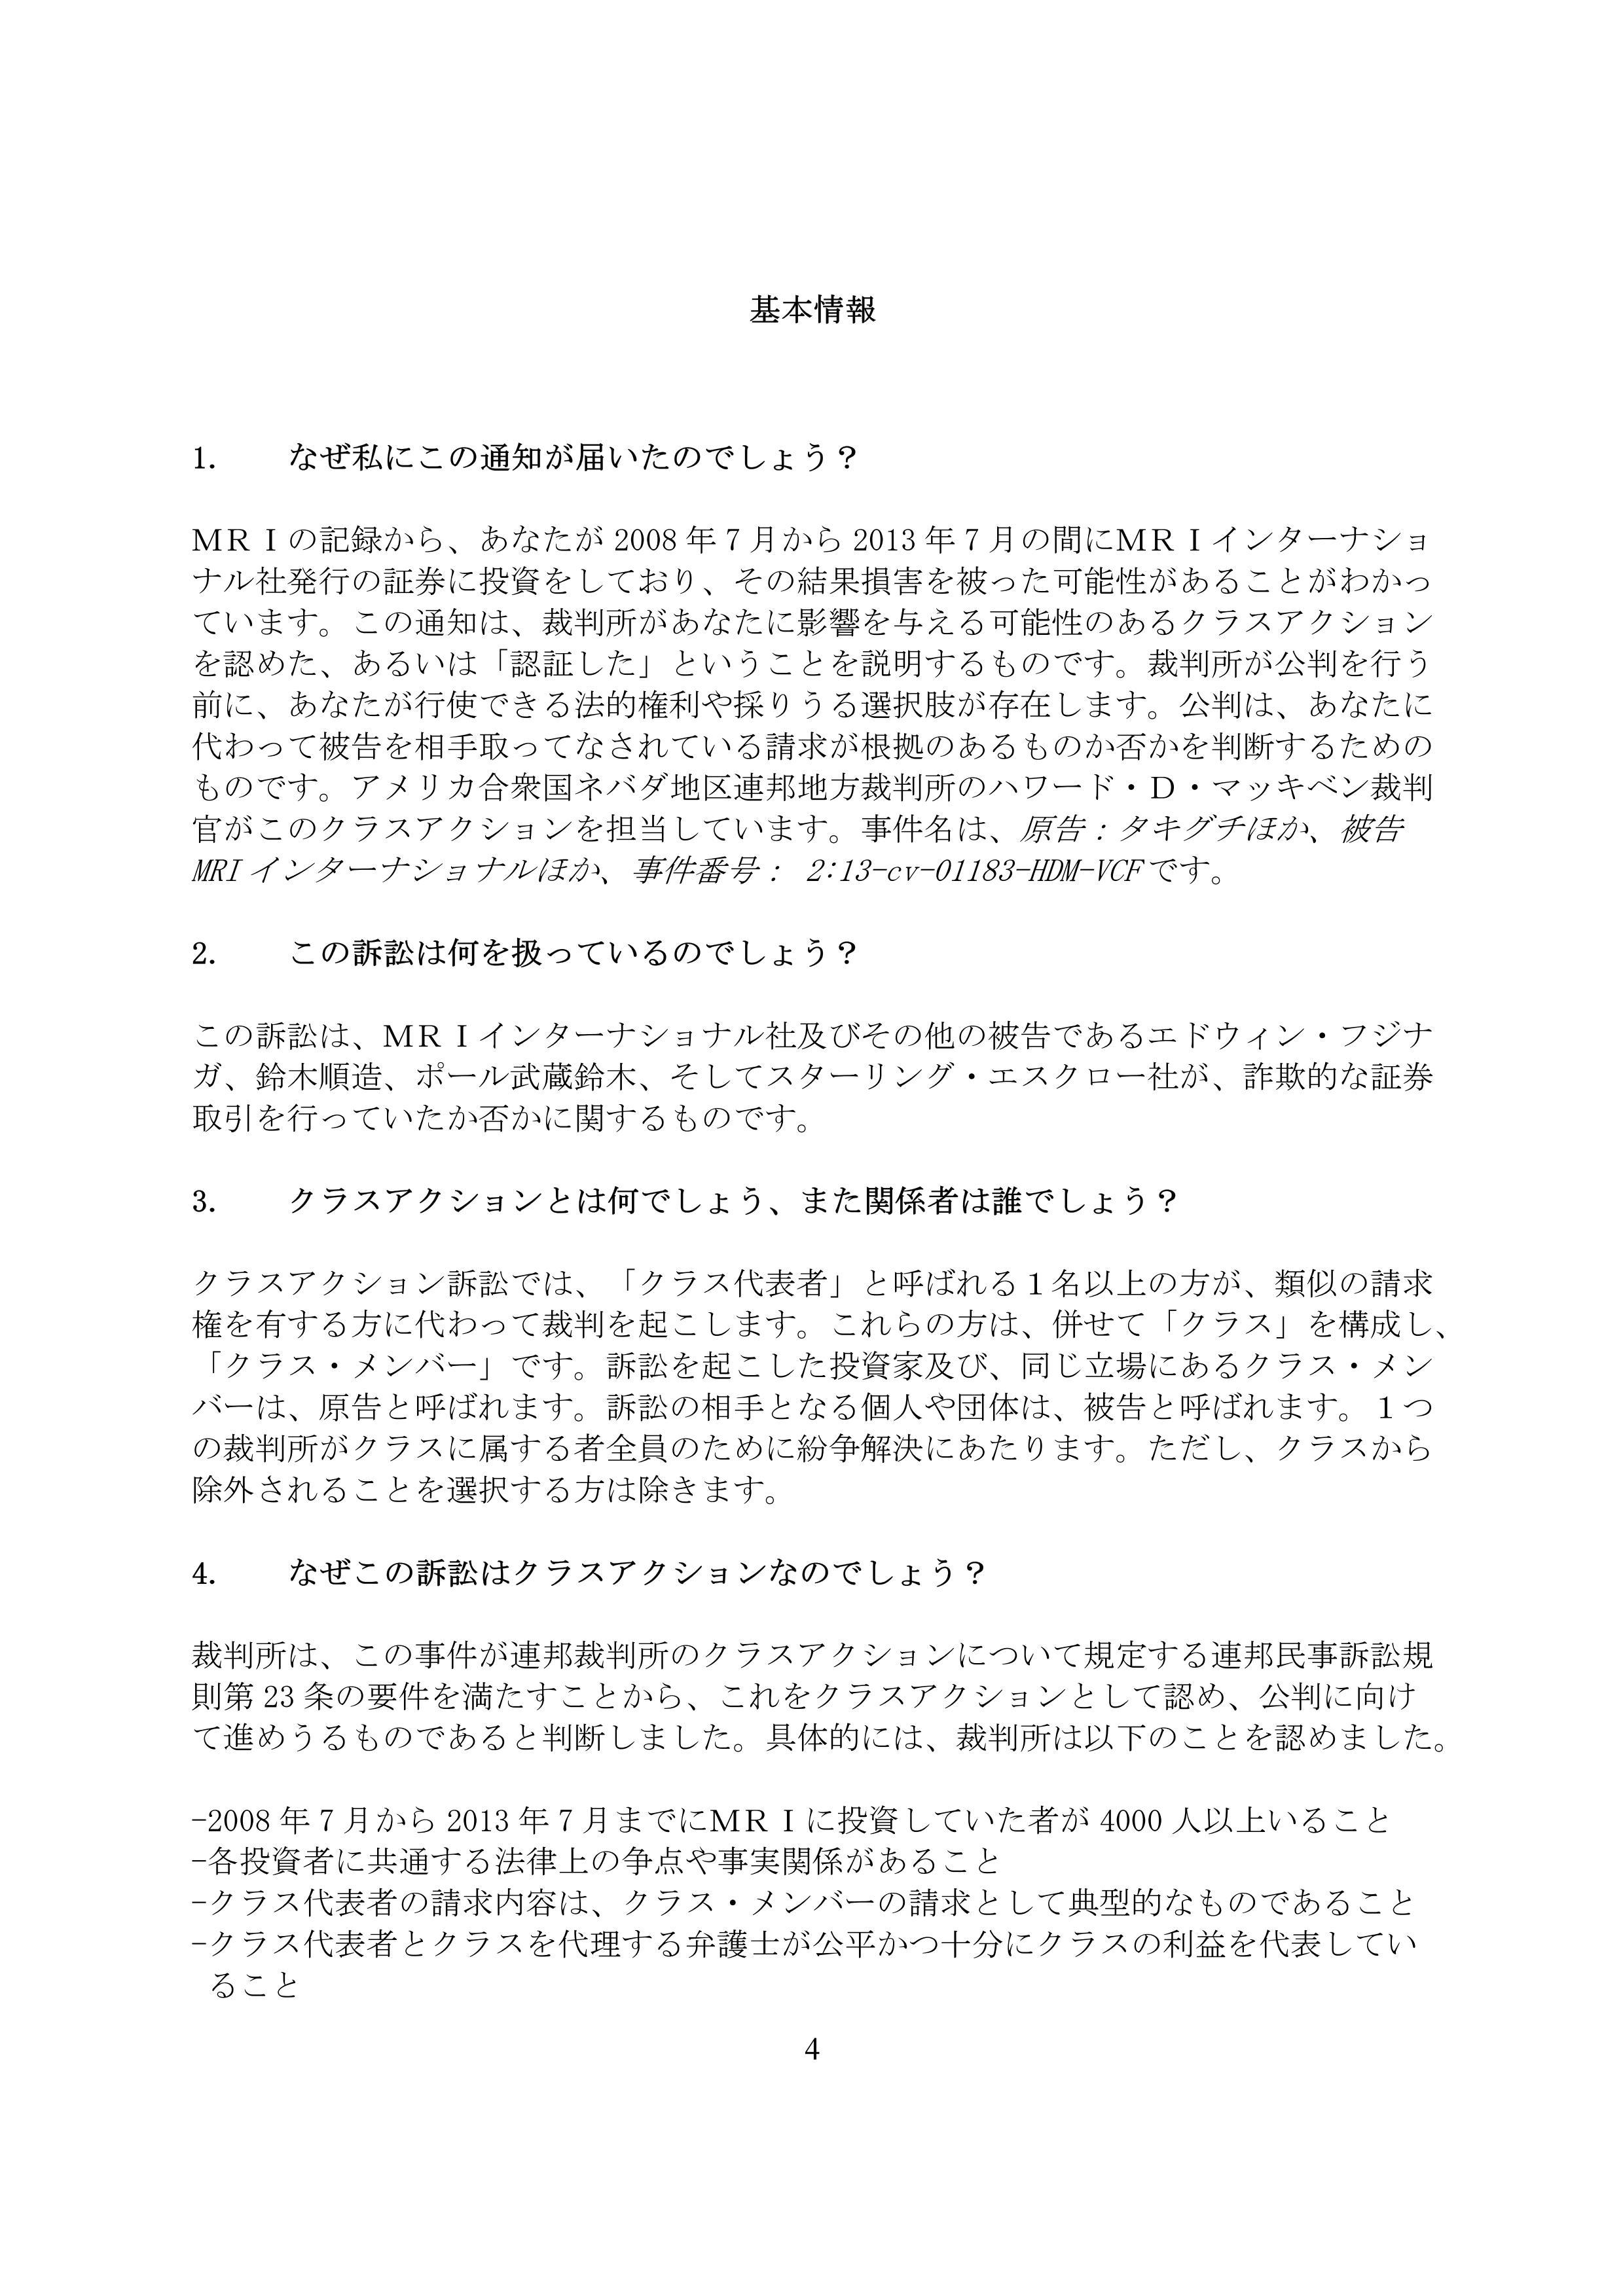 MRI Class Cert Notice_Japanese translation_04